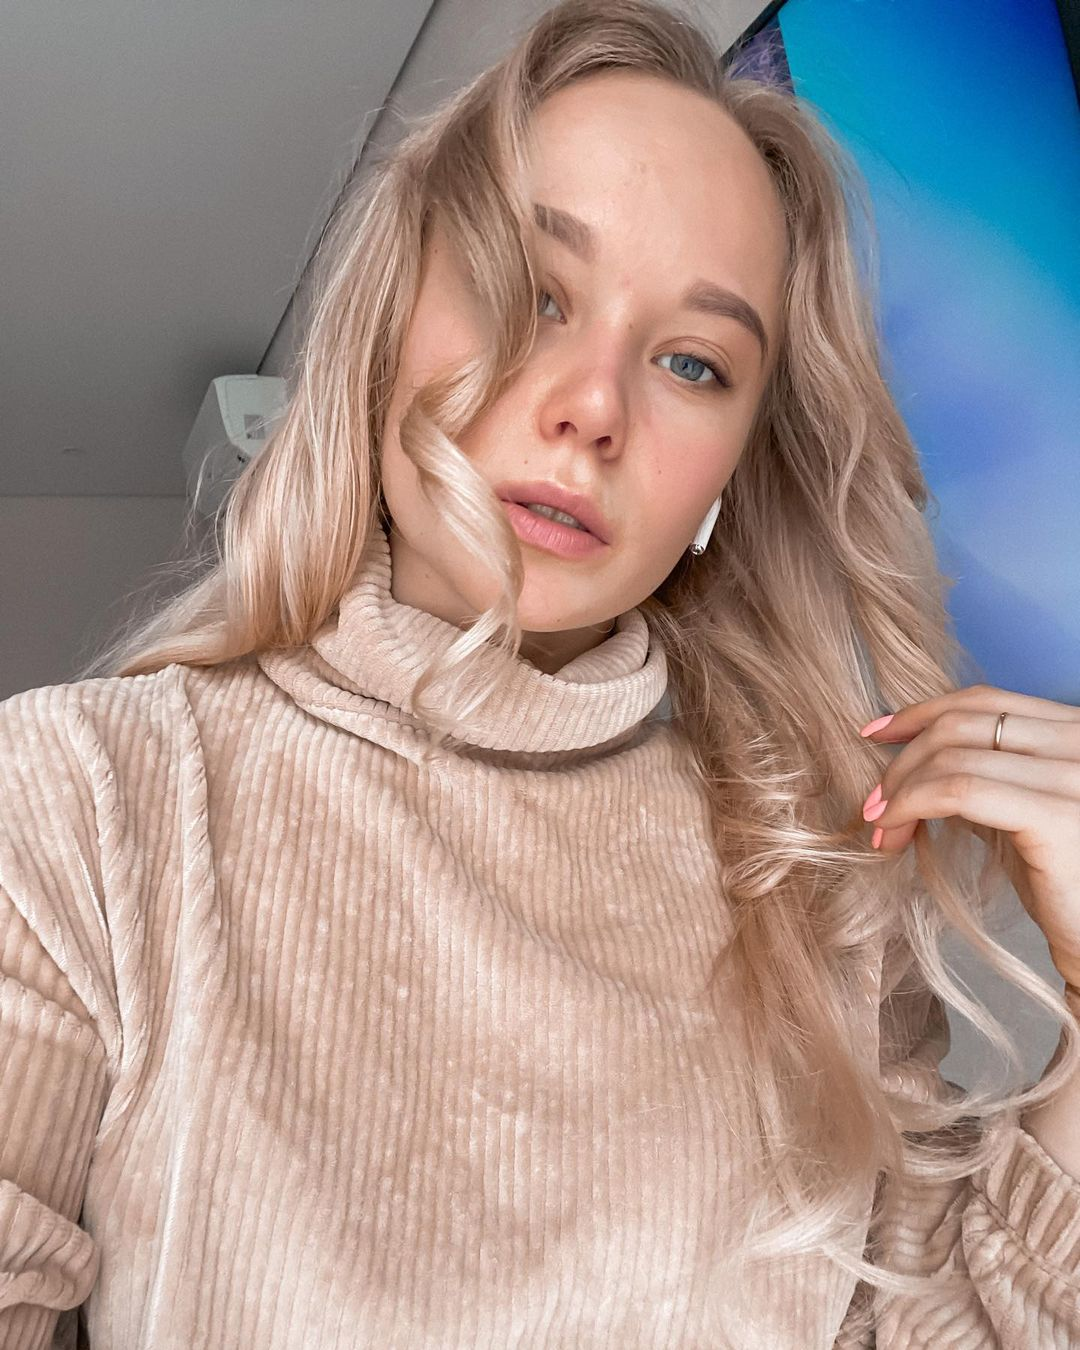 Angelina-Melnikova-Wallpapers-Insta-Fit-Bio-2